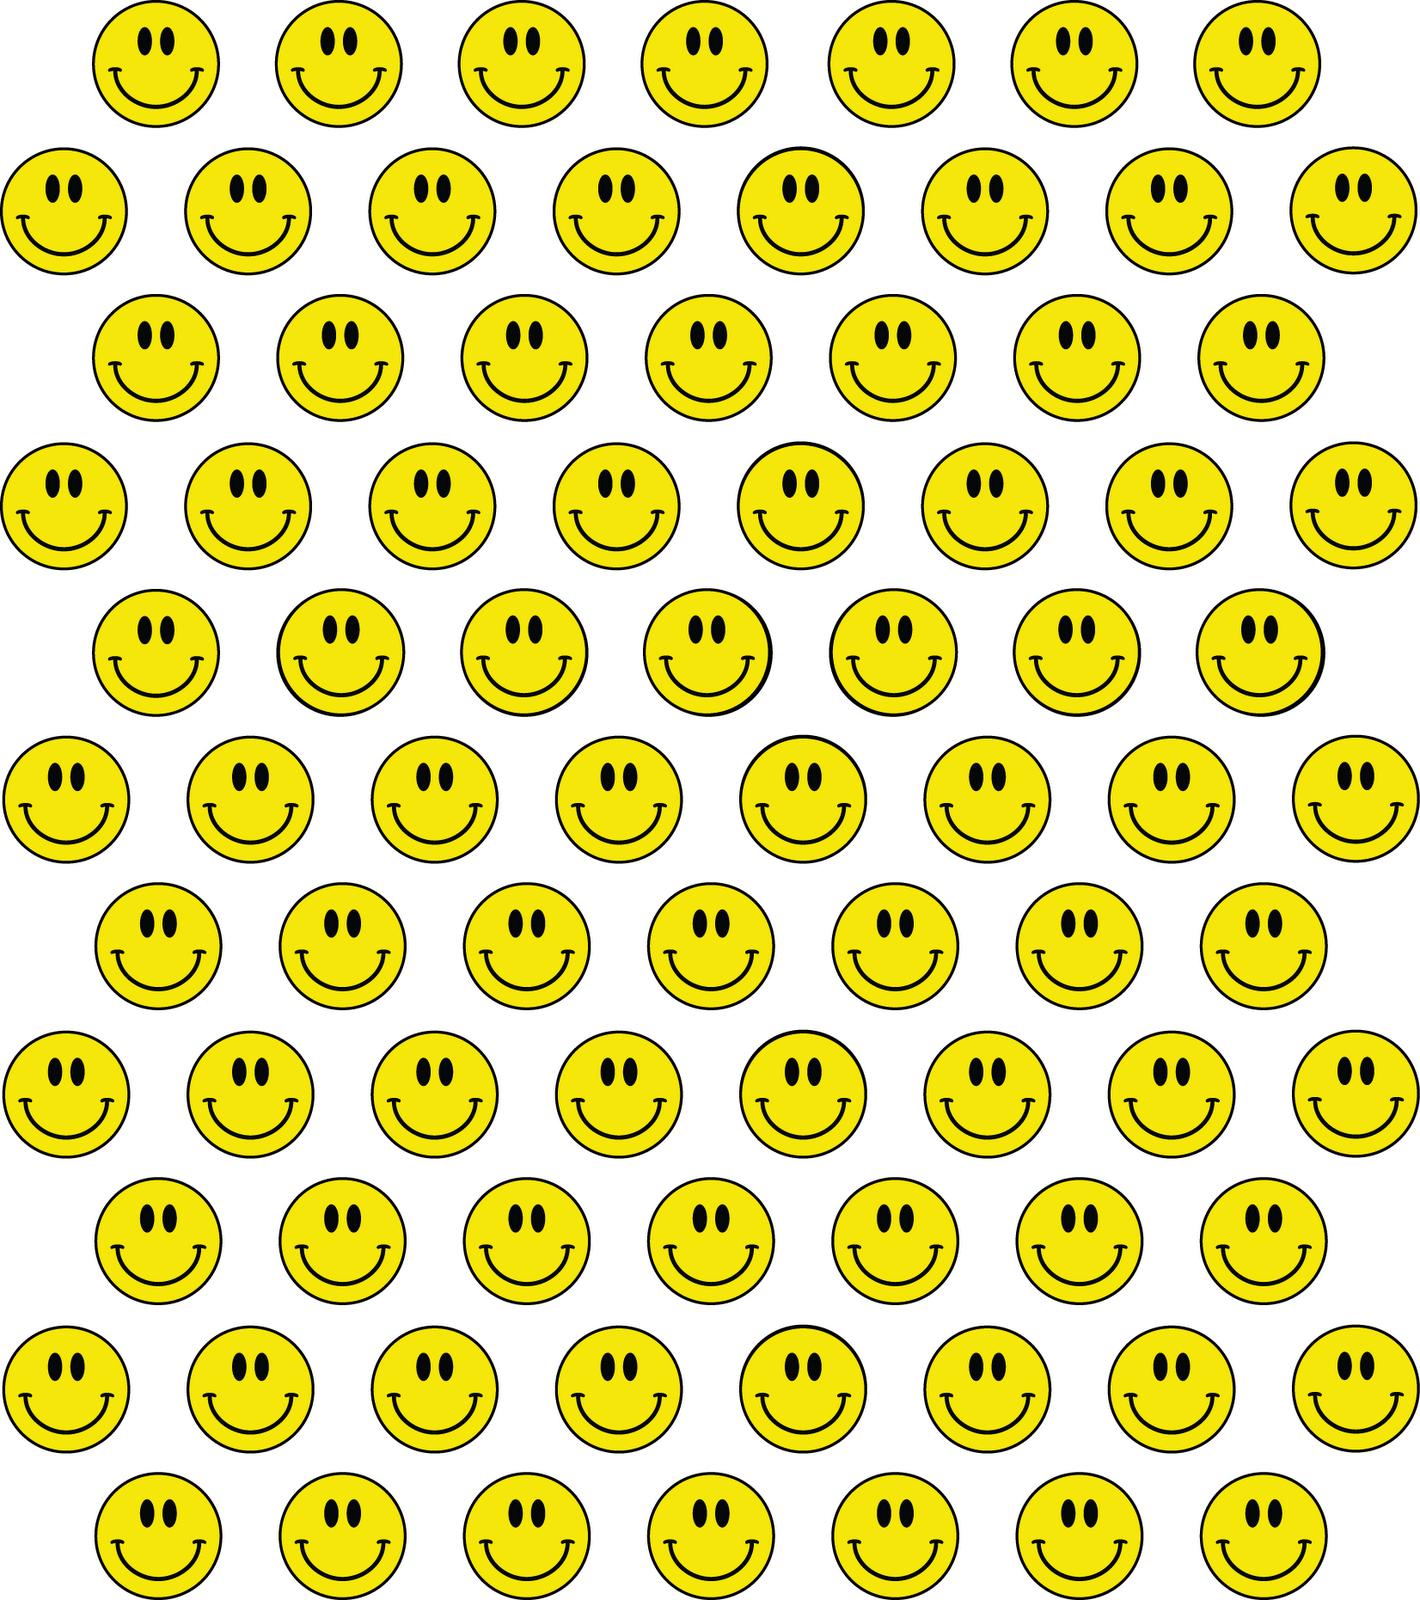 Smiley face image google search smileys pinterest smiley face image google search voltagebd Gallery